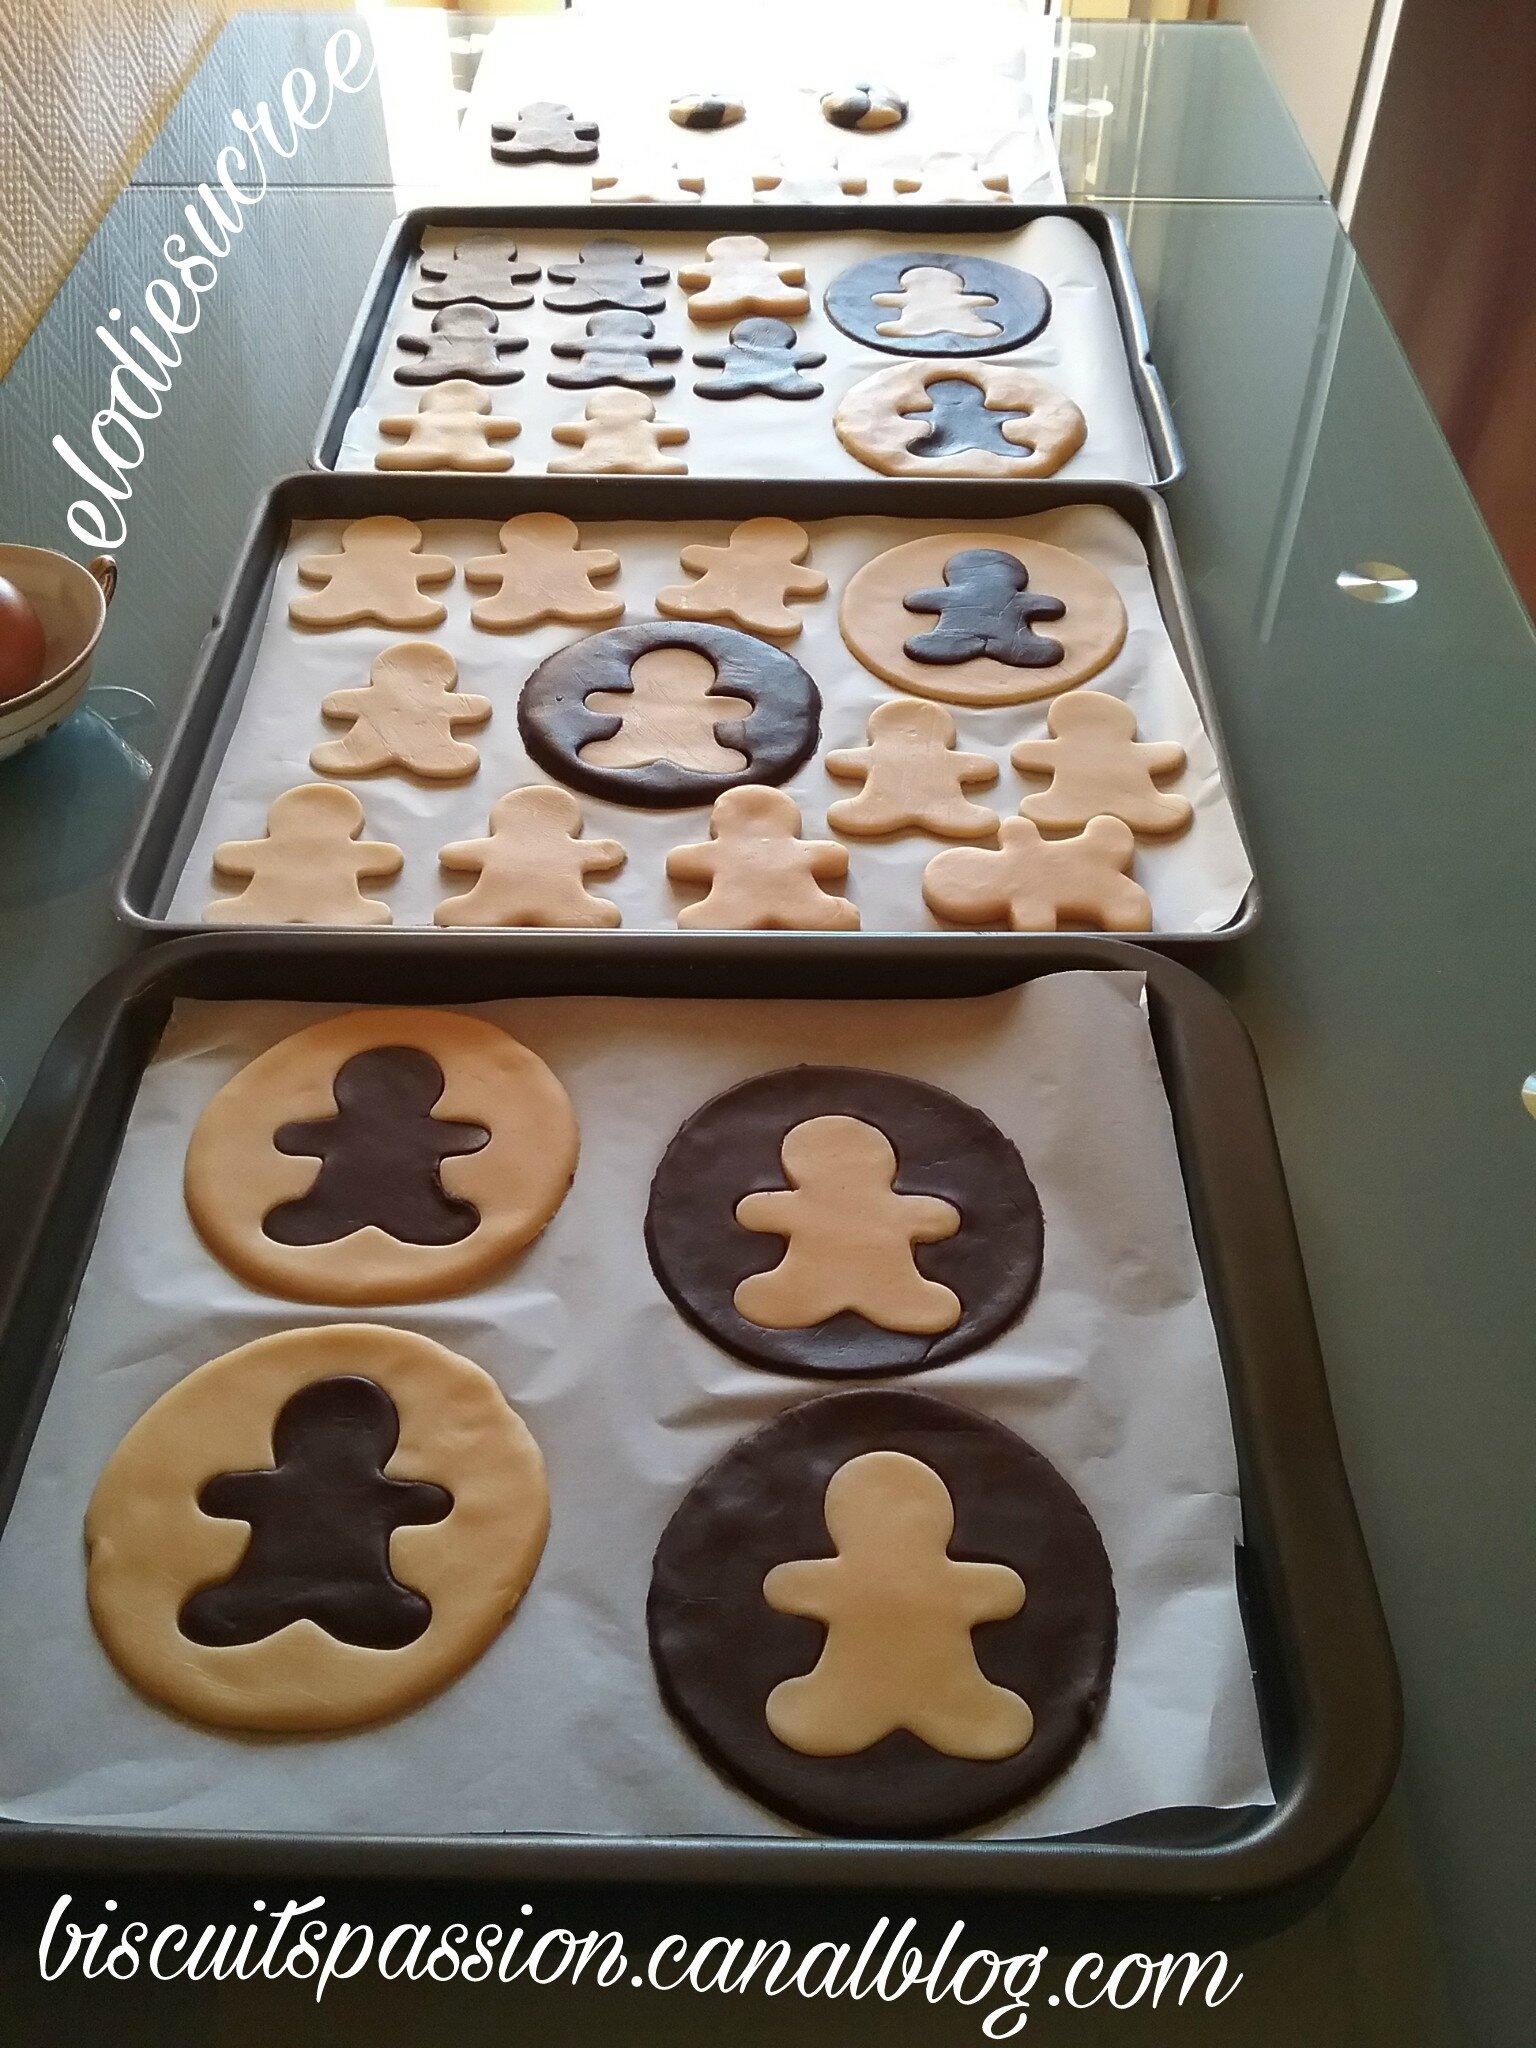 Biscuits Bonhomme vanille chocolat 050